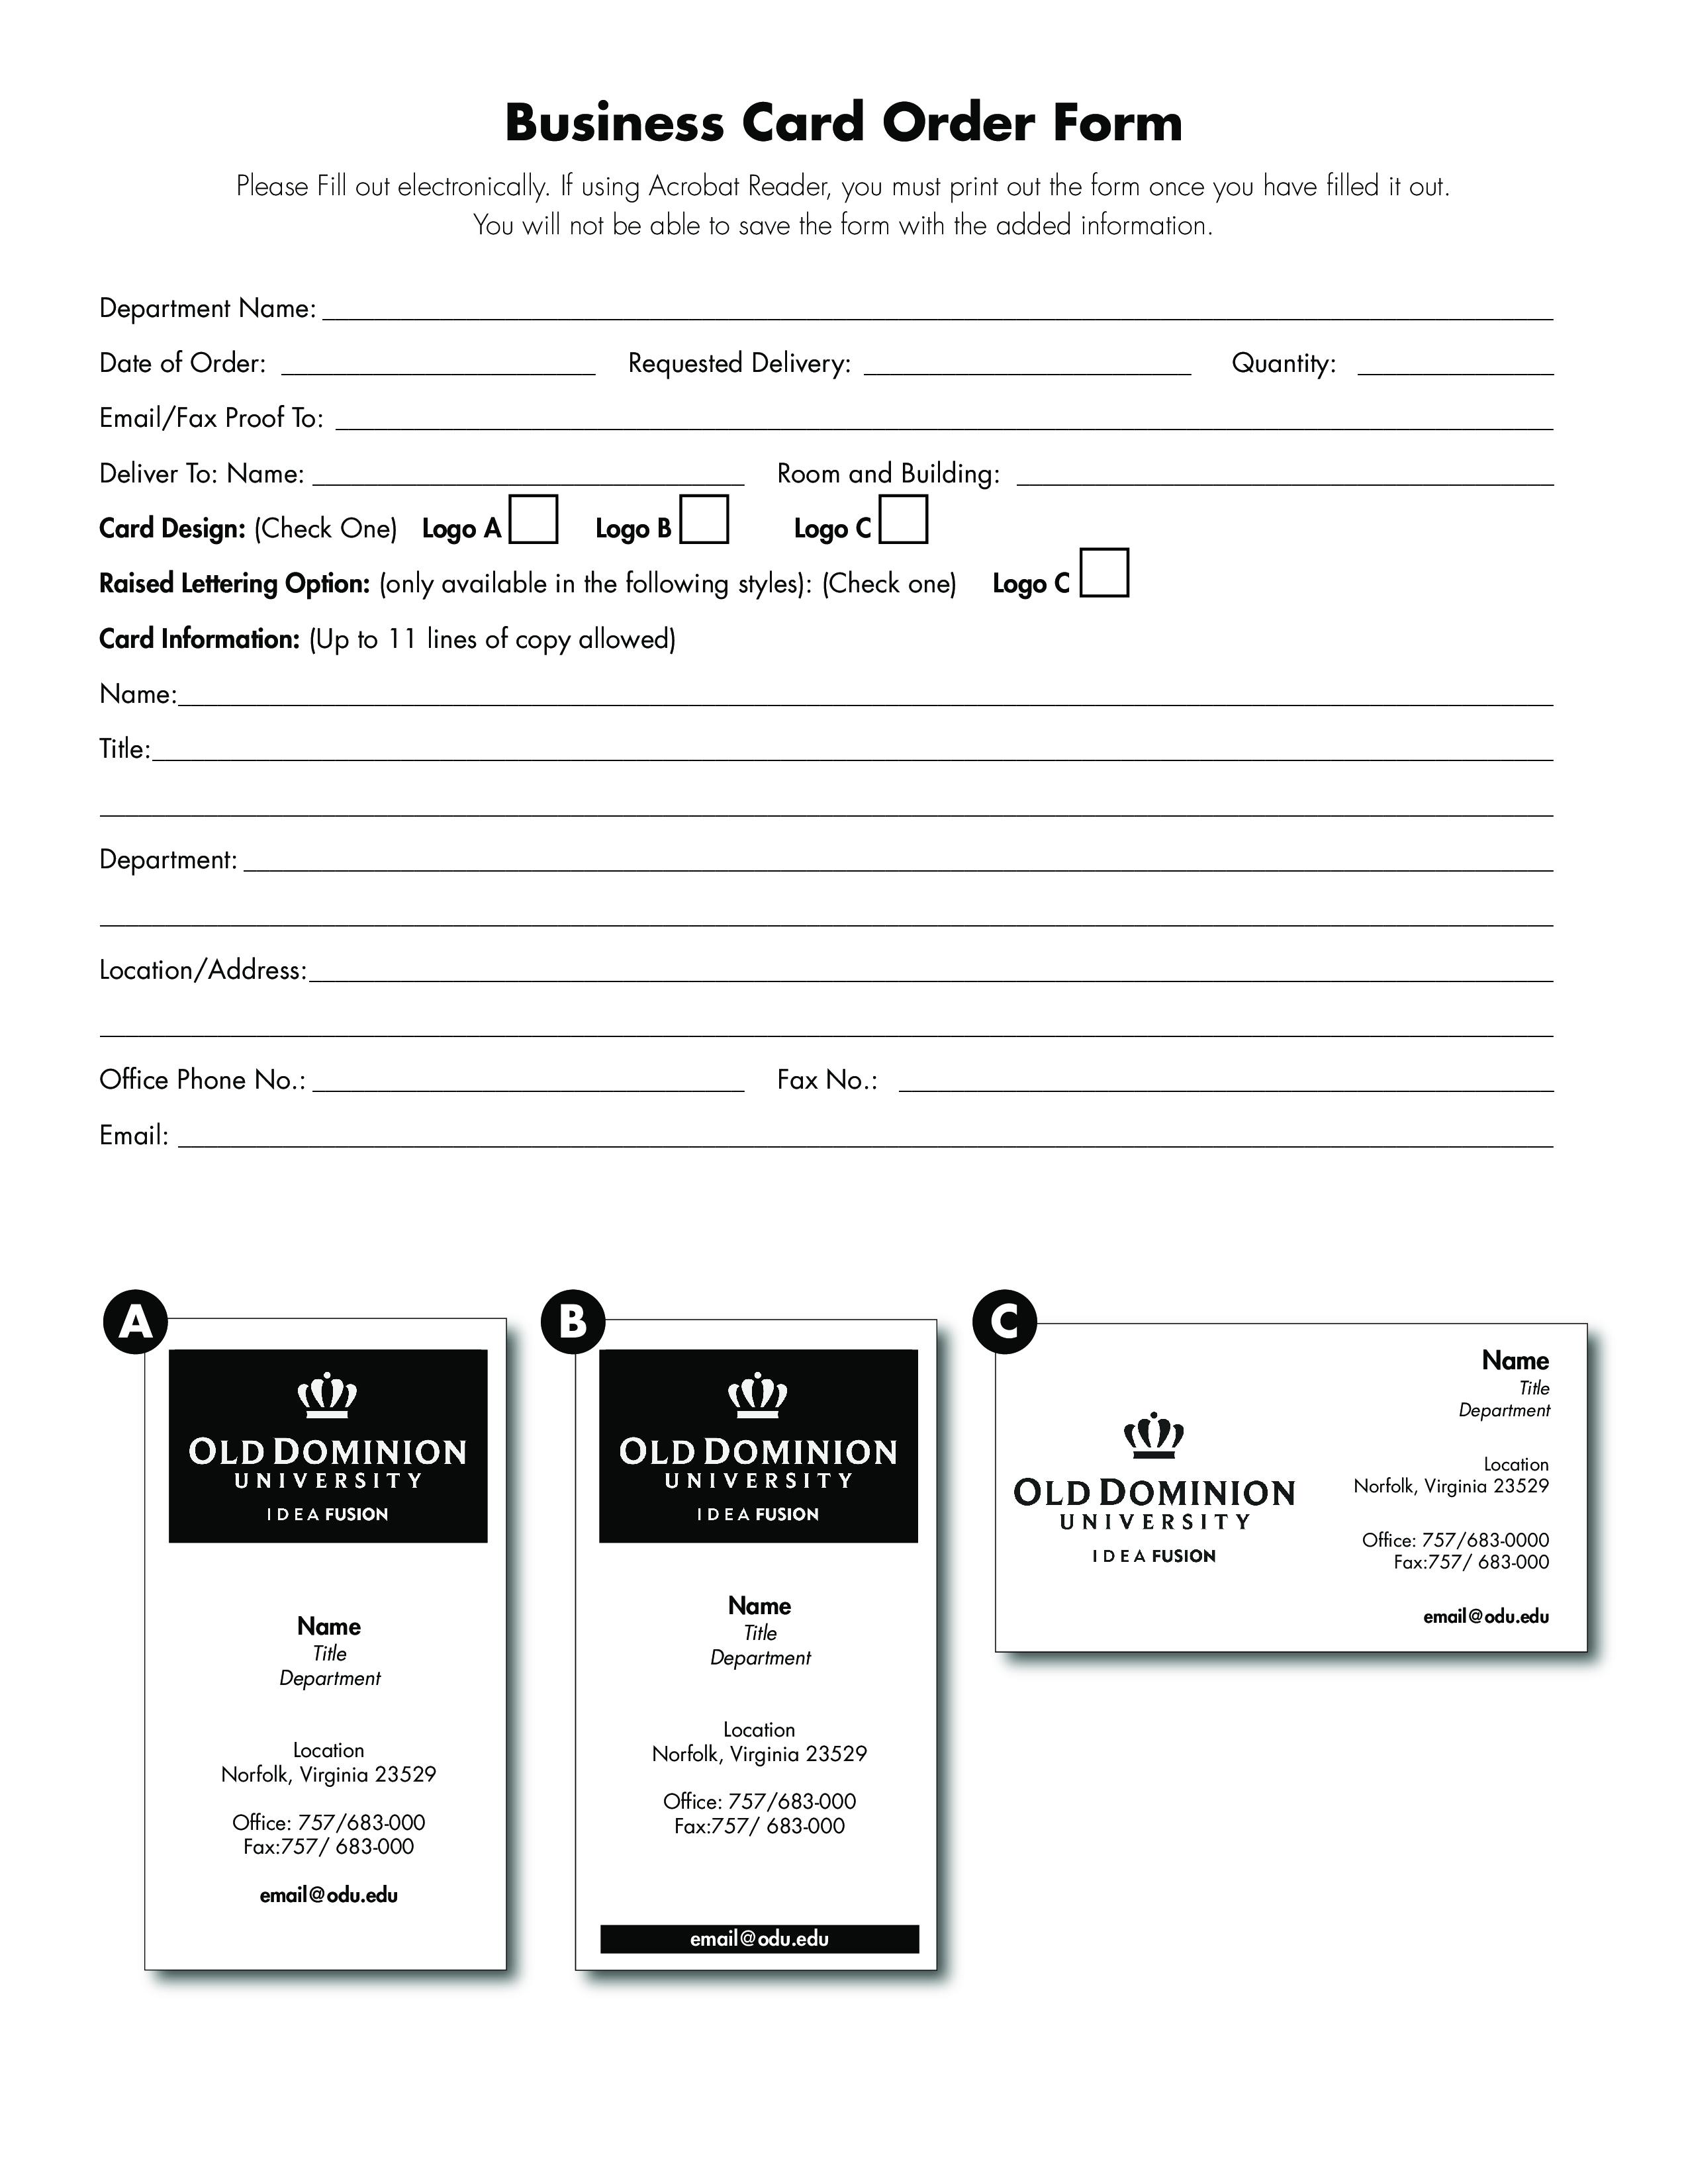 Free Business Order Form Templates At Allbusinesstemplates Com